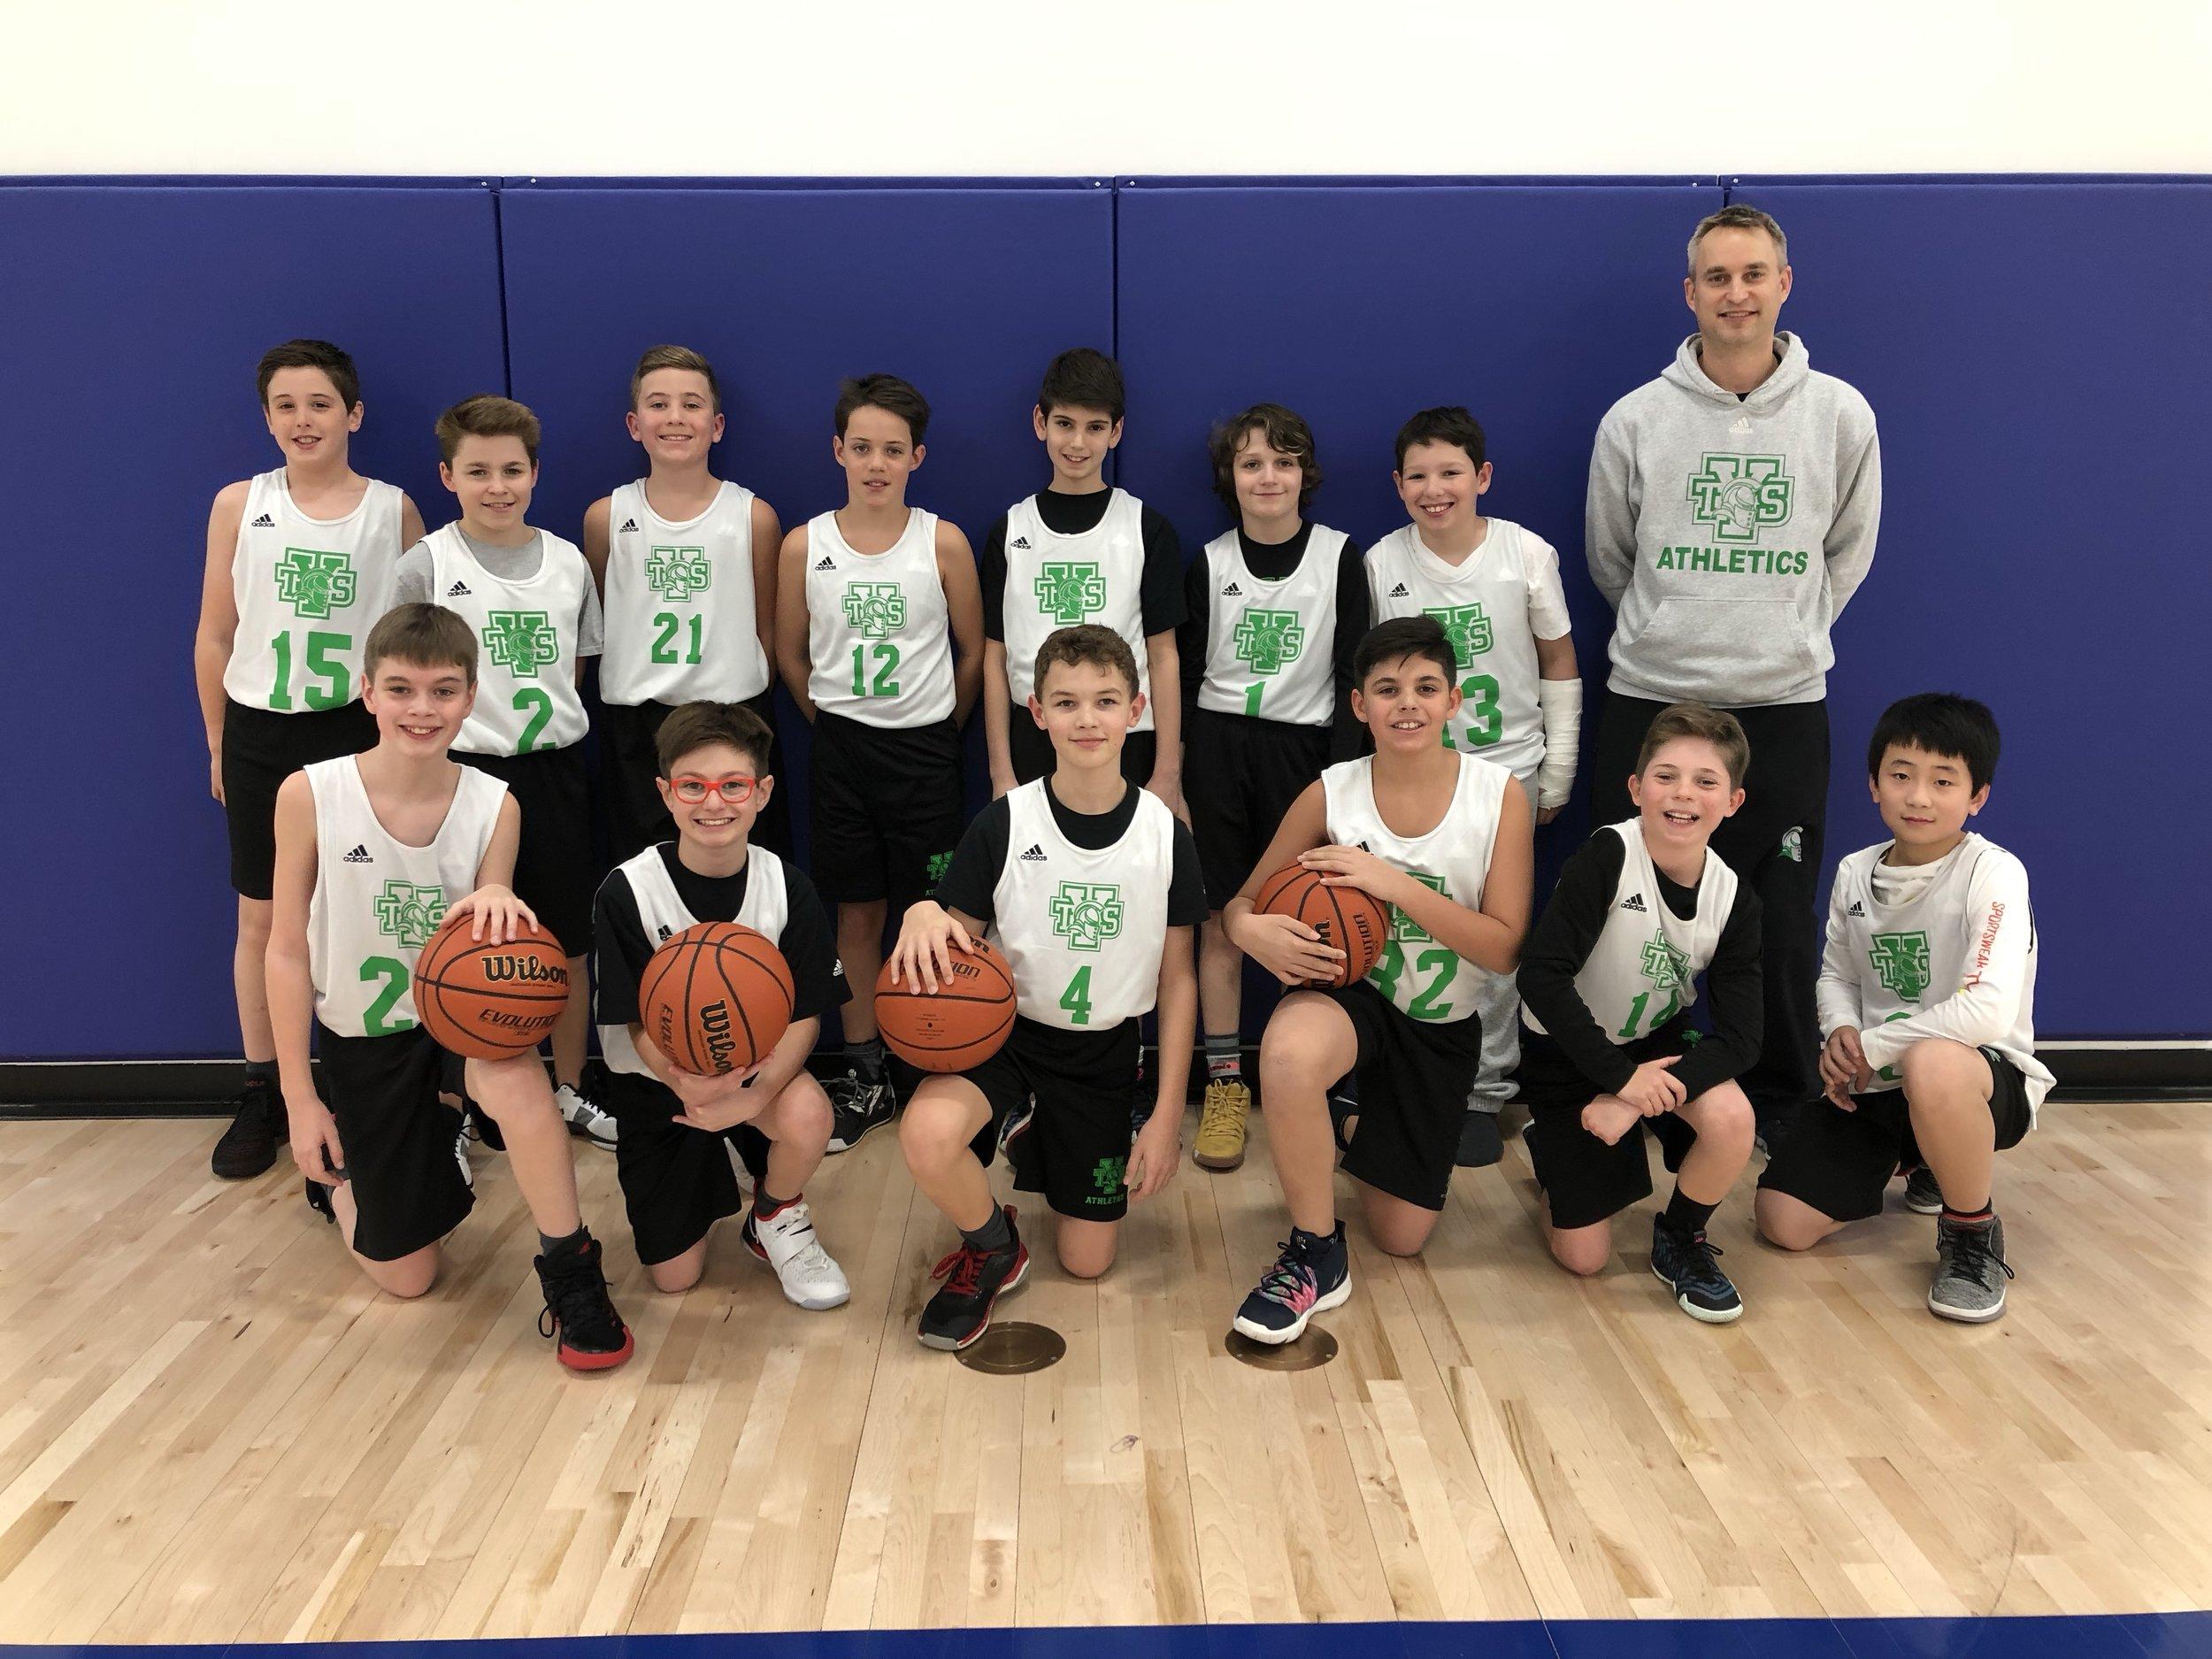 U12 Boys Basketball Team Pic.jpg